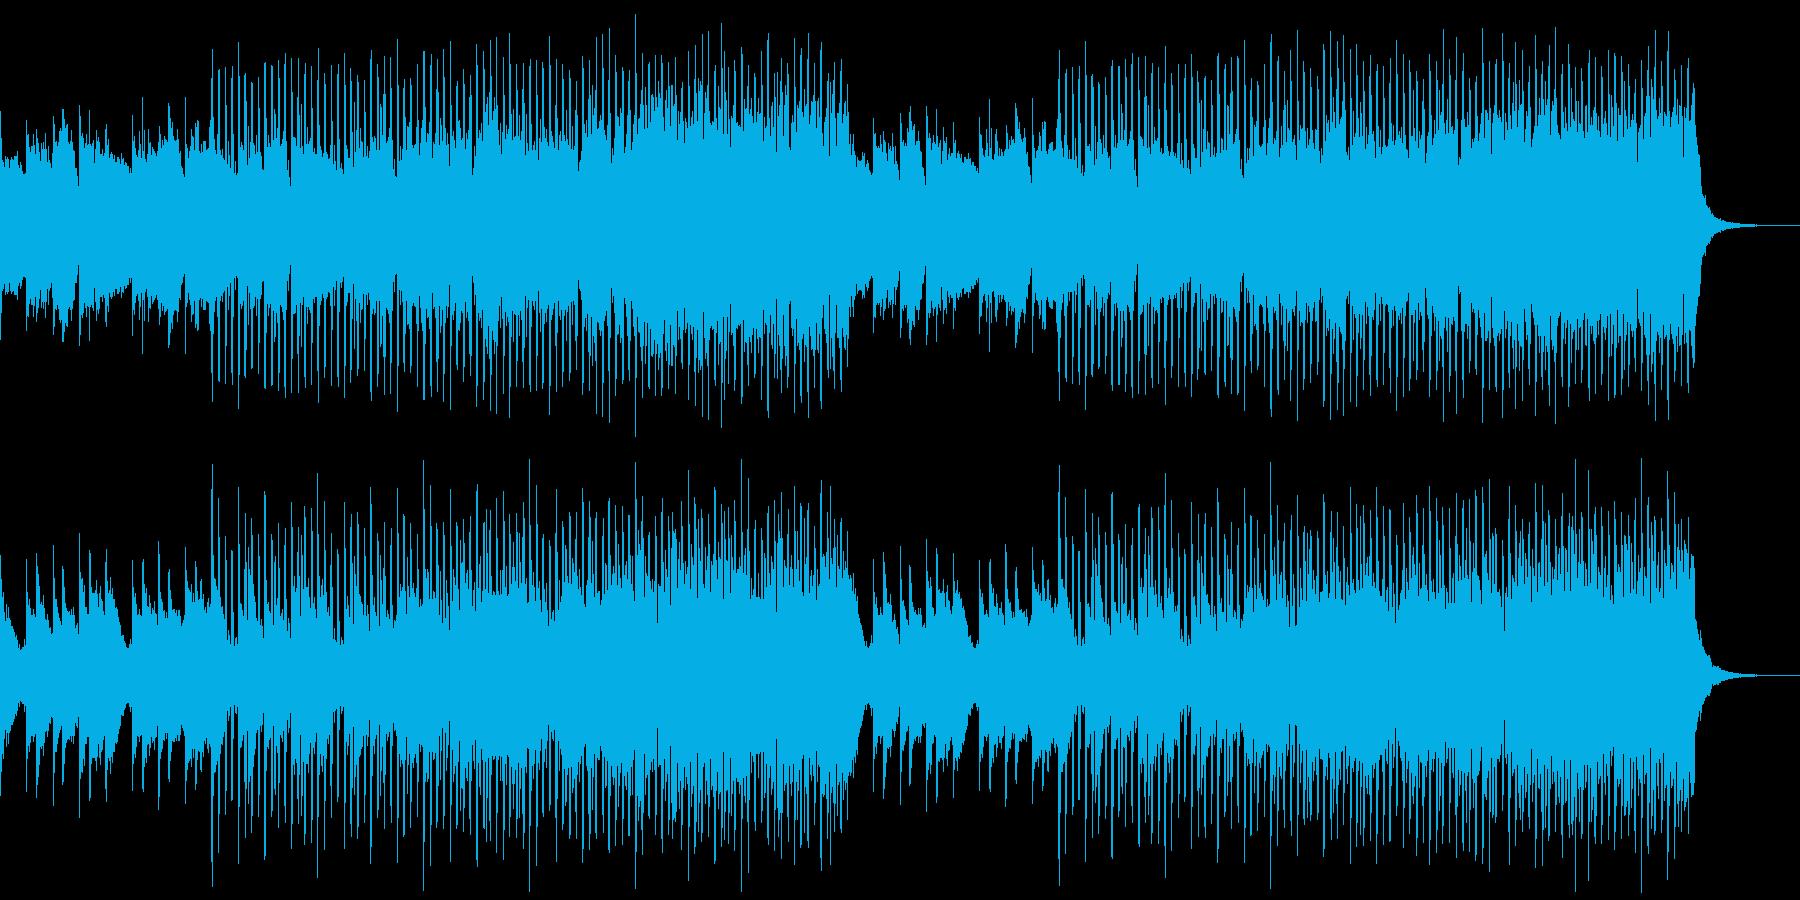 Company VP140, refreshing, 4 hits, piano a's reproduced waveform